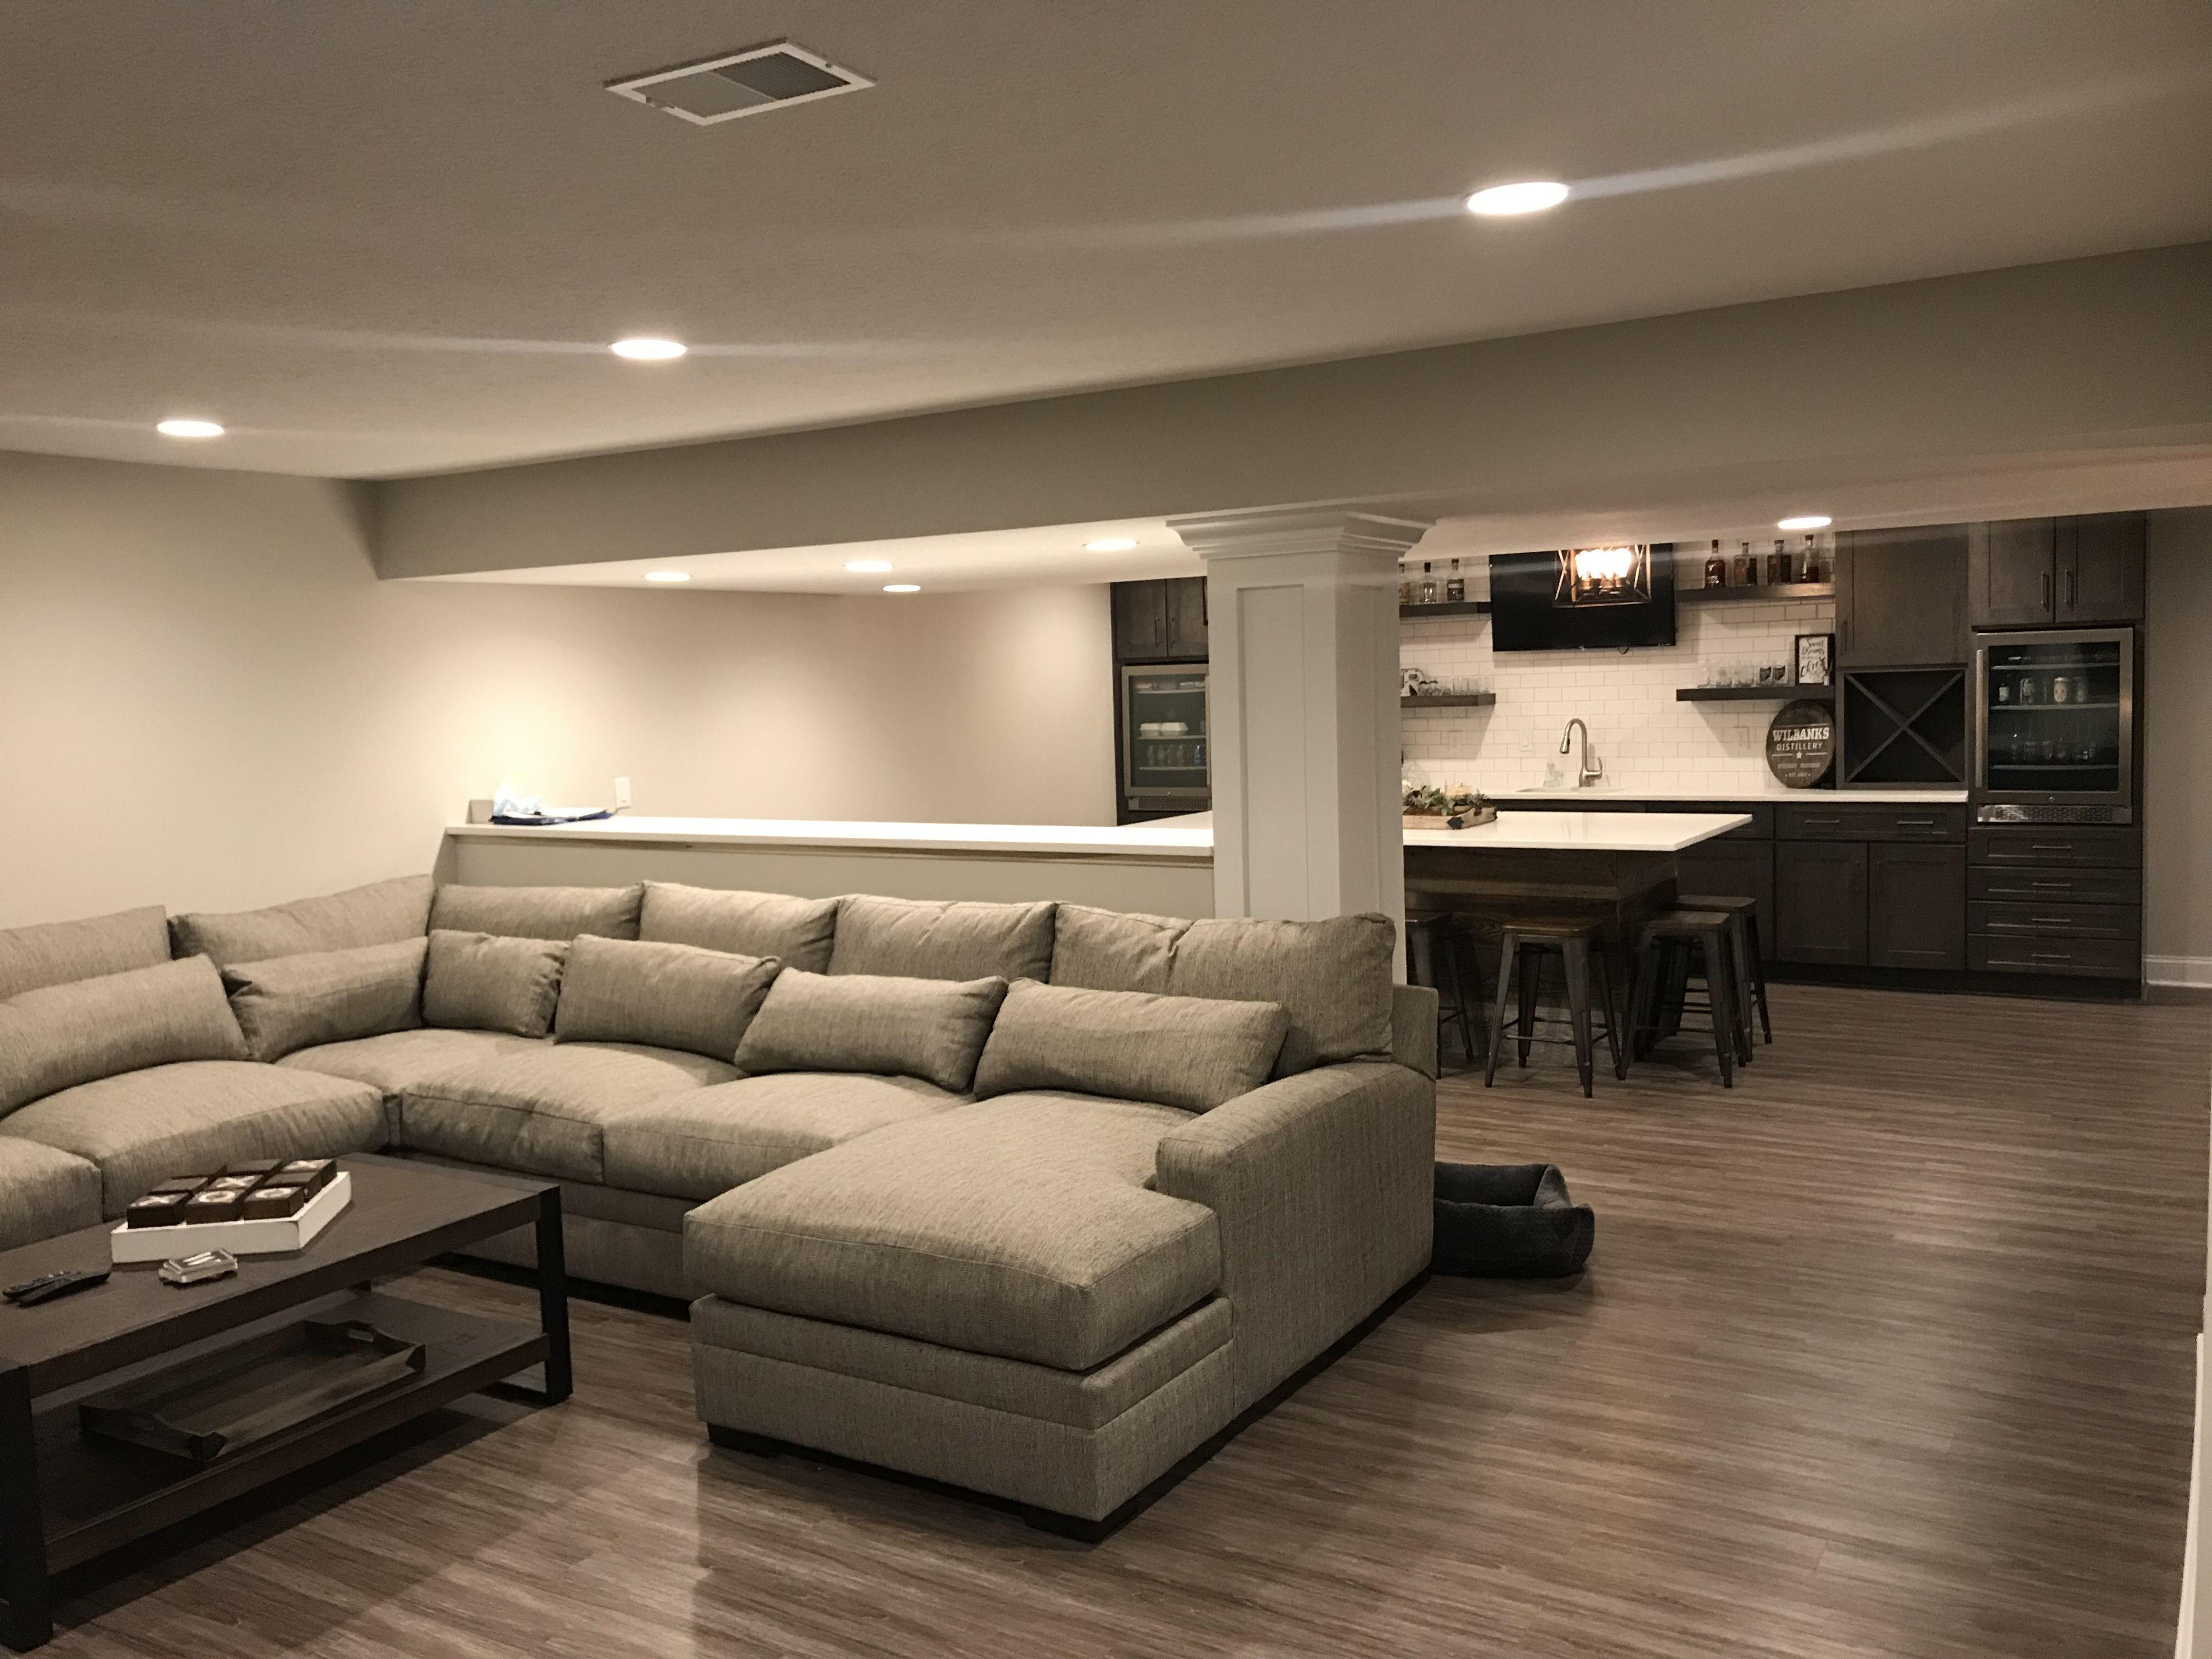 Finished Basement Media Bar Basementremodeling Finishing Basement Home Home Theater Rooms